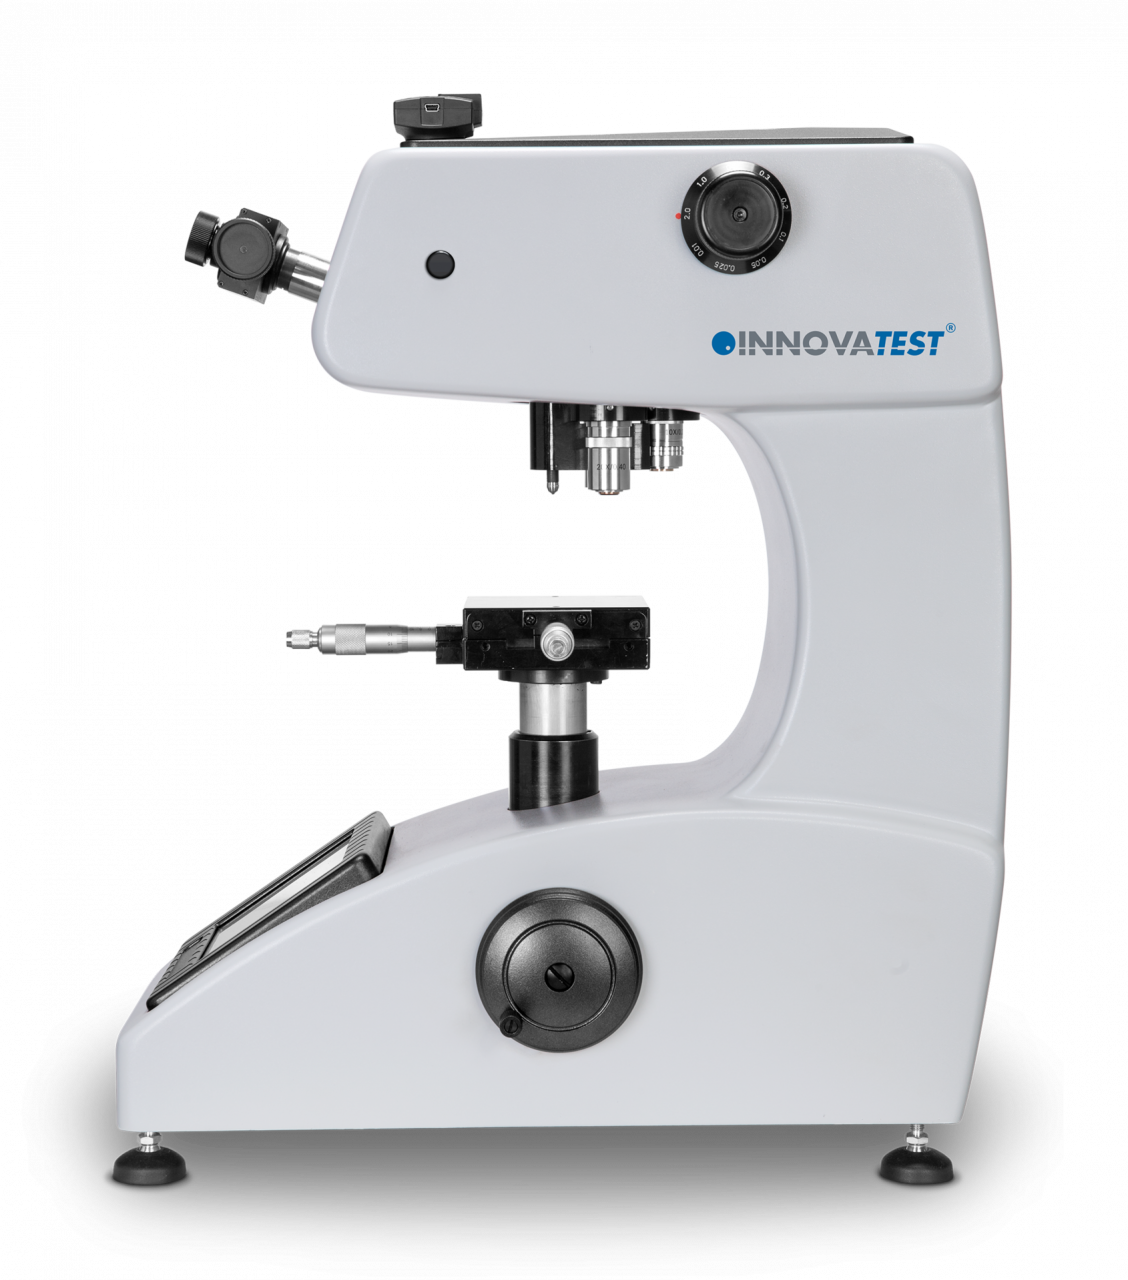 innovatest-nova-240-left-vickers-hardness-tester